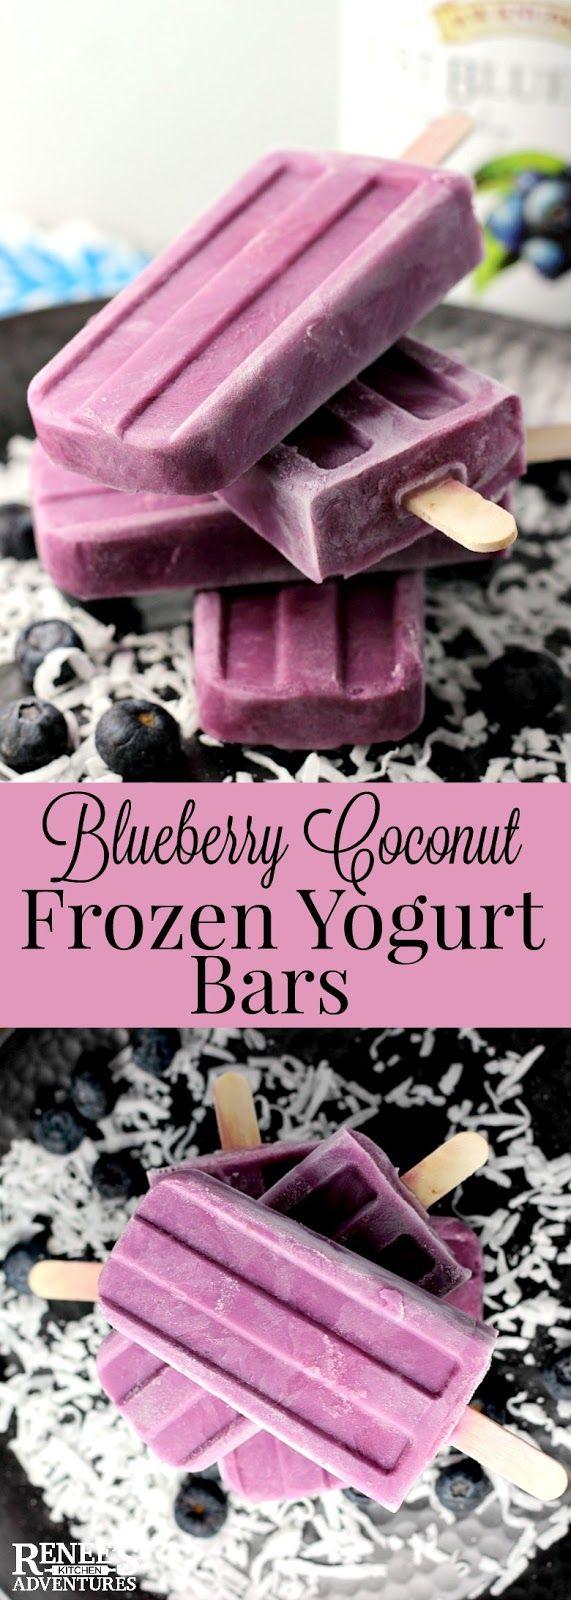 Blueberry Coconut Frozen Yogurt Bars   Renee's Kitchen Adventures - Easy recipe for homemade frozen yogurt bars made with blueberry juice and Greek yogurt. #ad @RWKnudsen